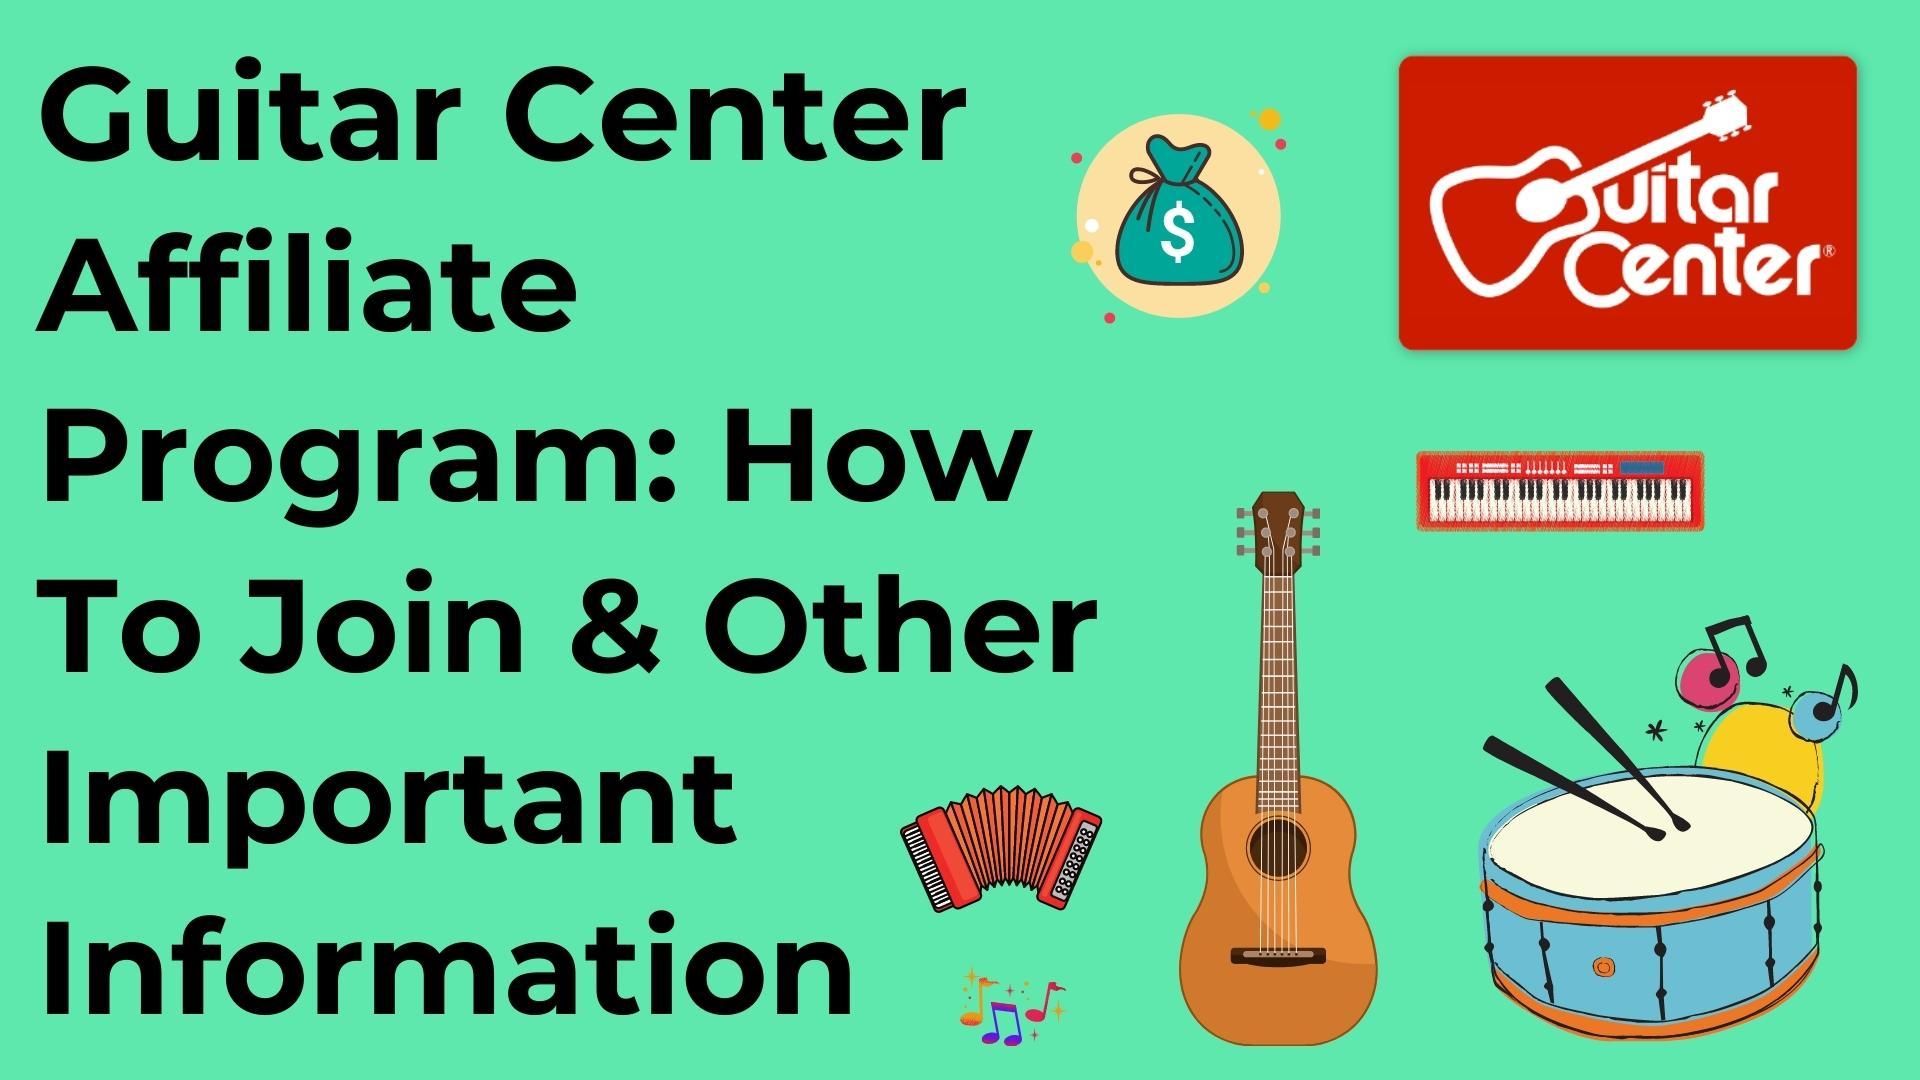 Guitar Center Affiliate Program: Details & How To Join